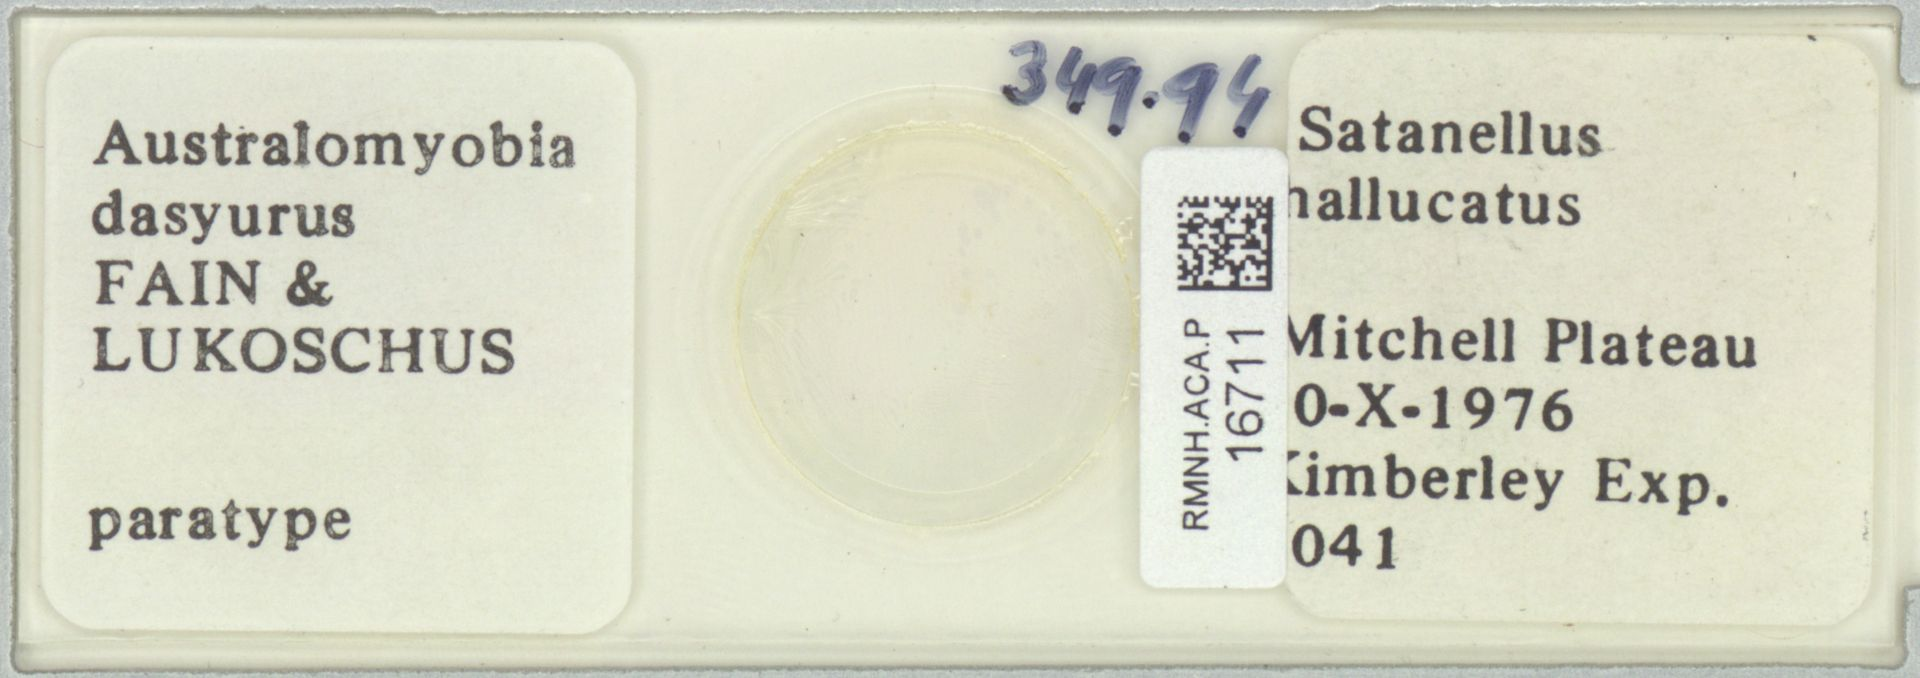 RMNH.ACA.P.16711 | Australomyobia dasyurus